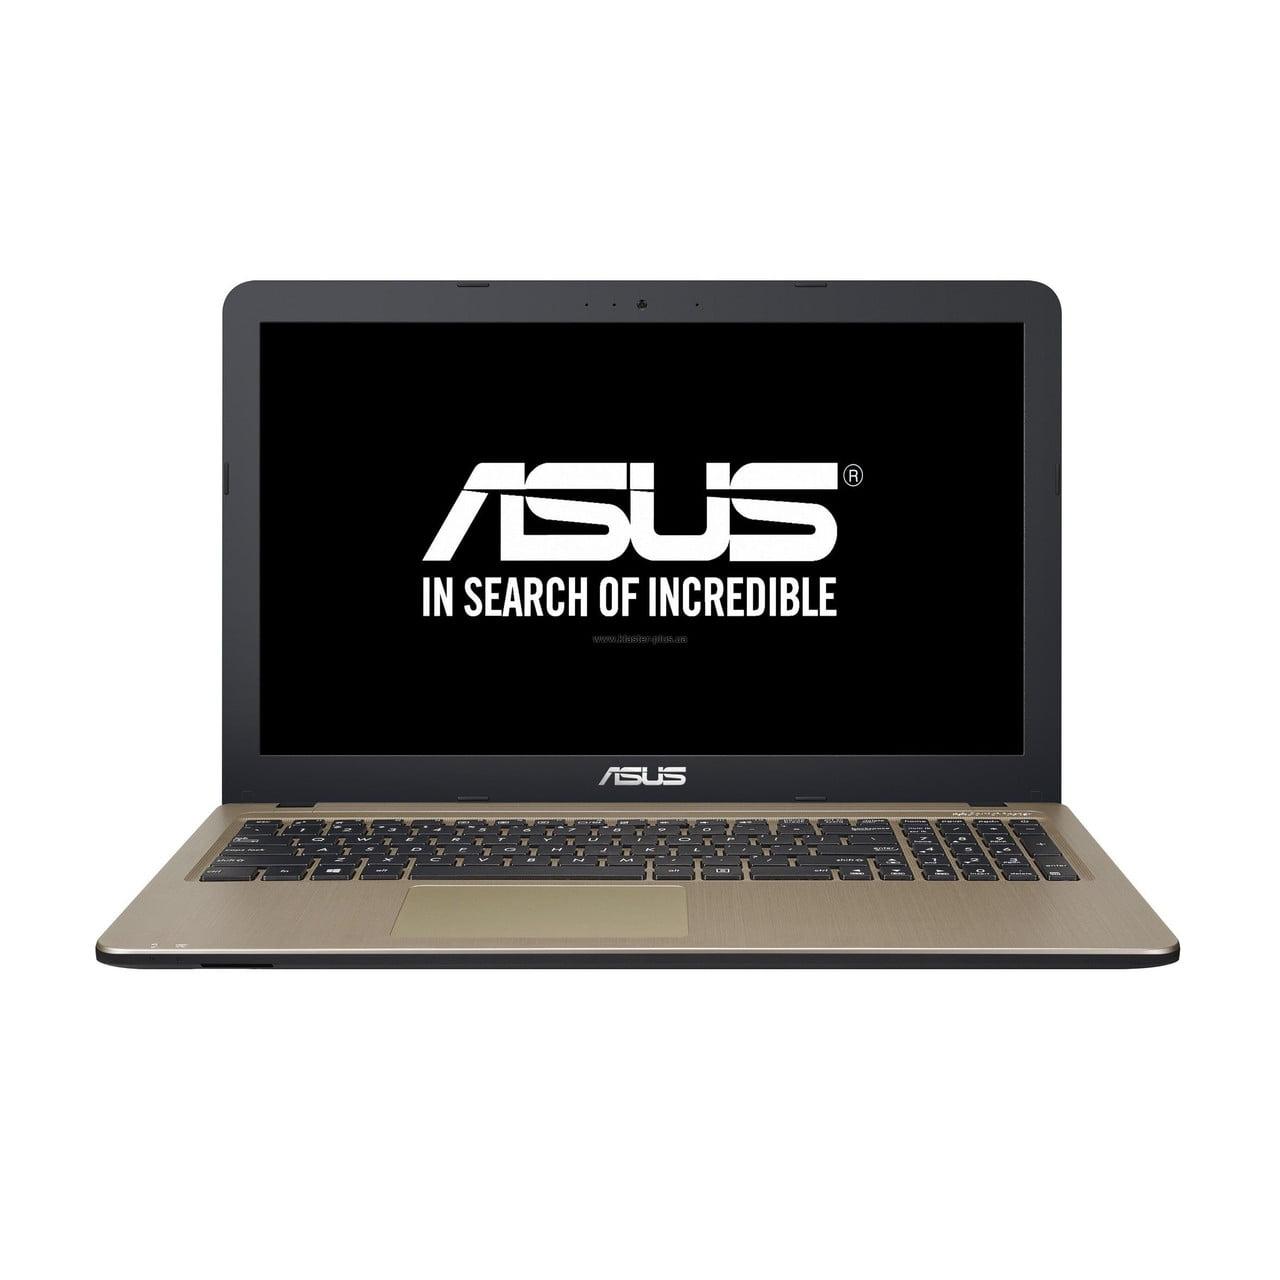 "Asus 15.6"" Notebook - Intel Celeron 1.6GHz 4GB 500GB Win ..."